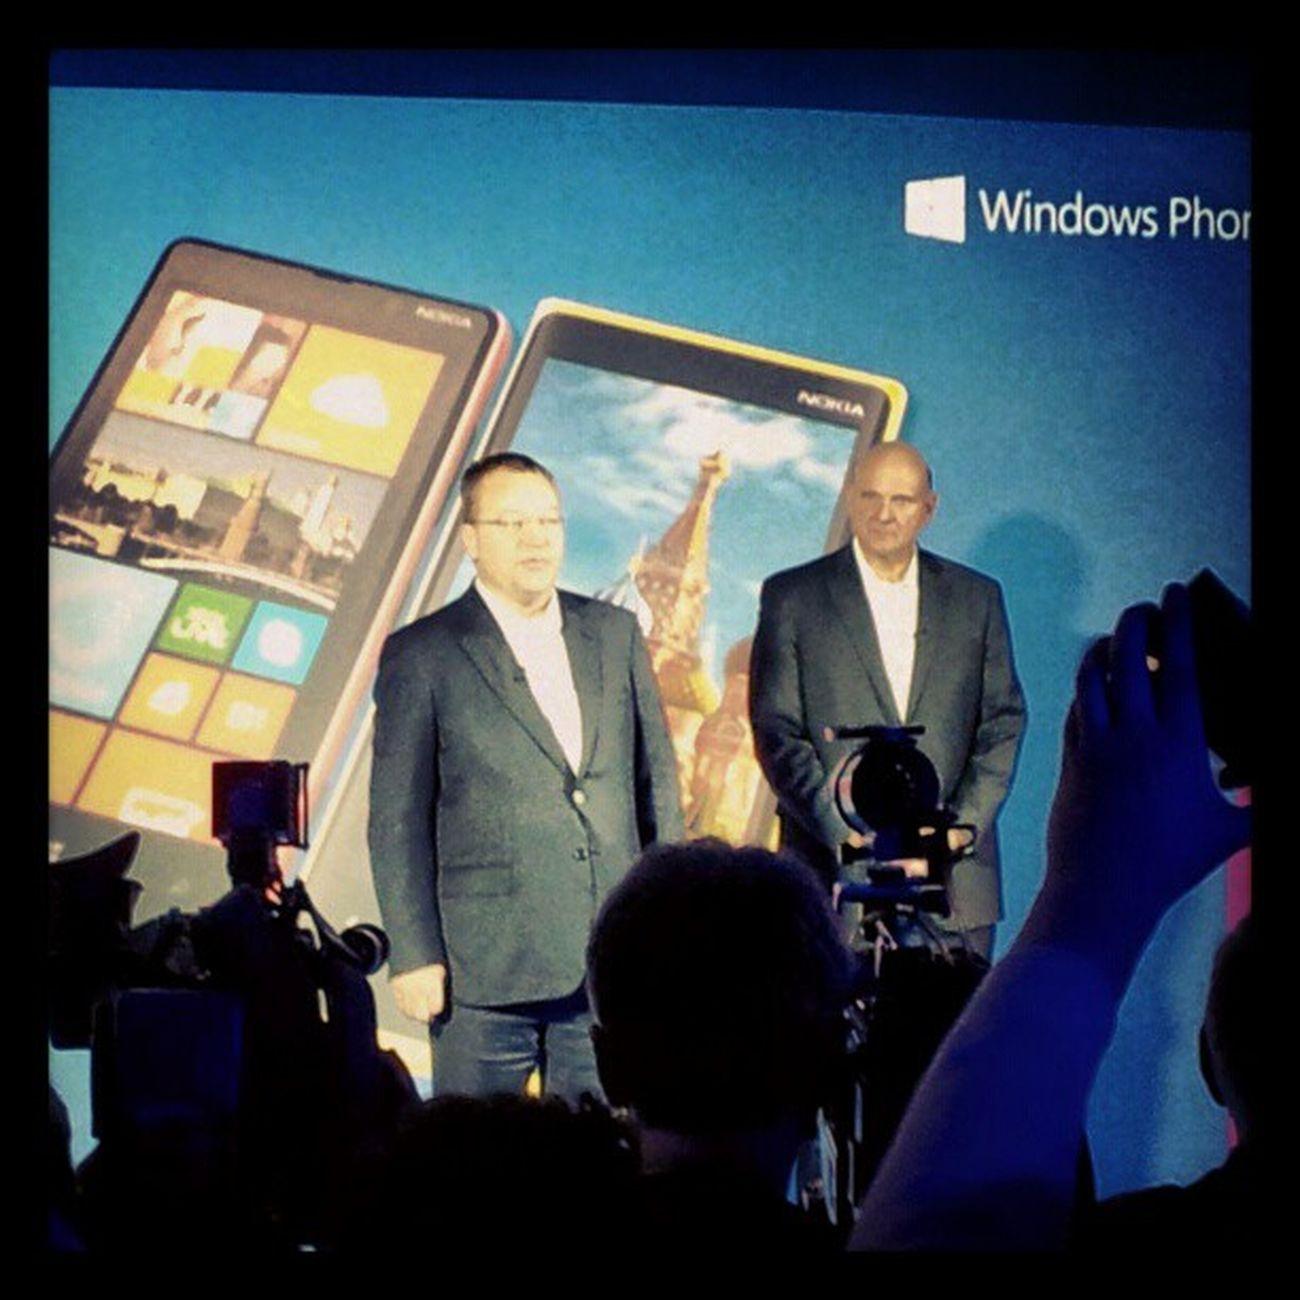 SteveBallmer и StephenElop NOKIAWIN Nokia  Lumia